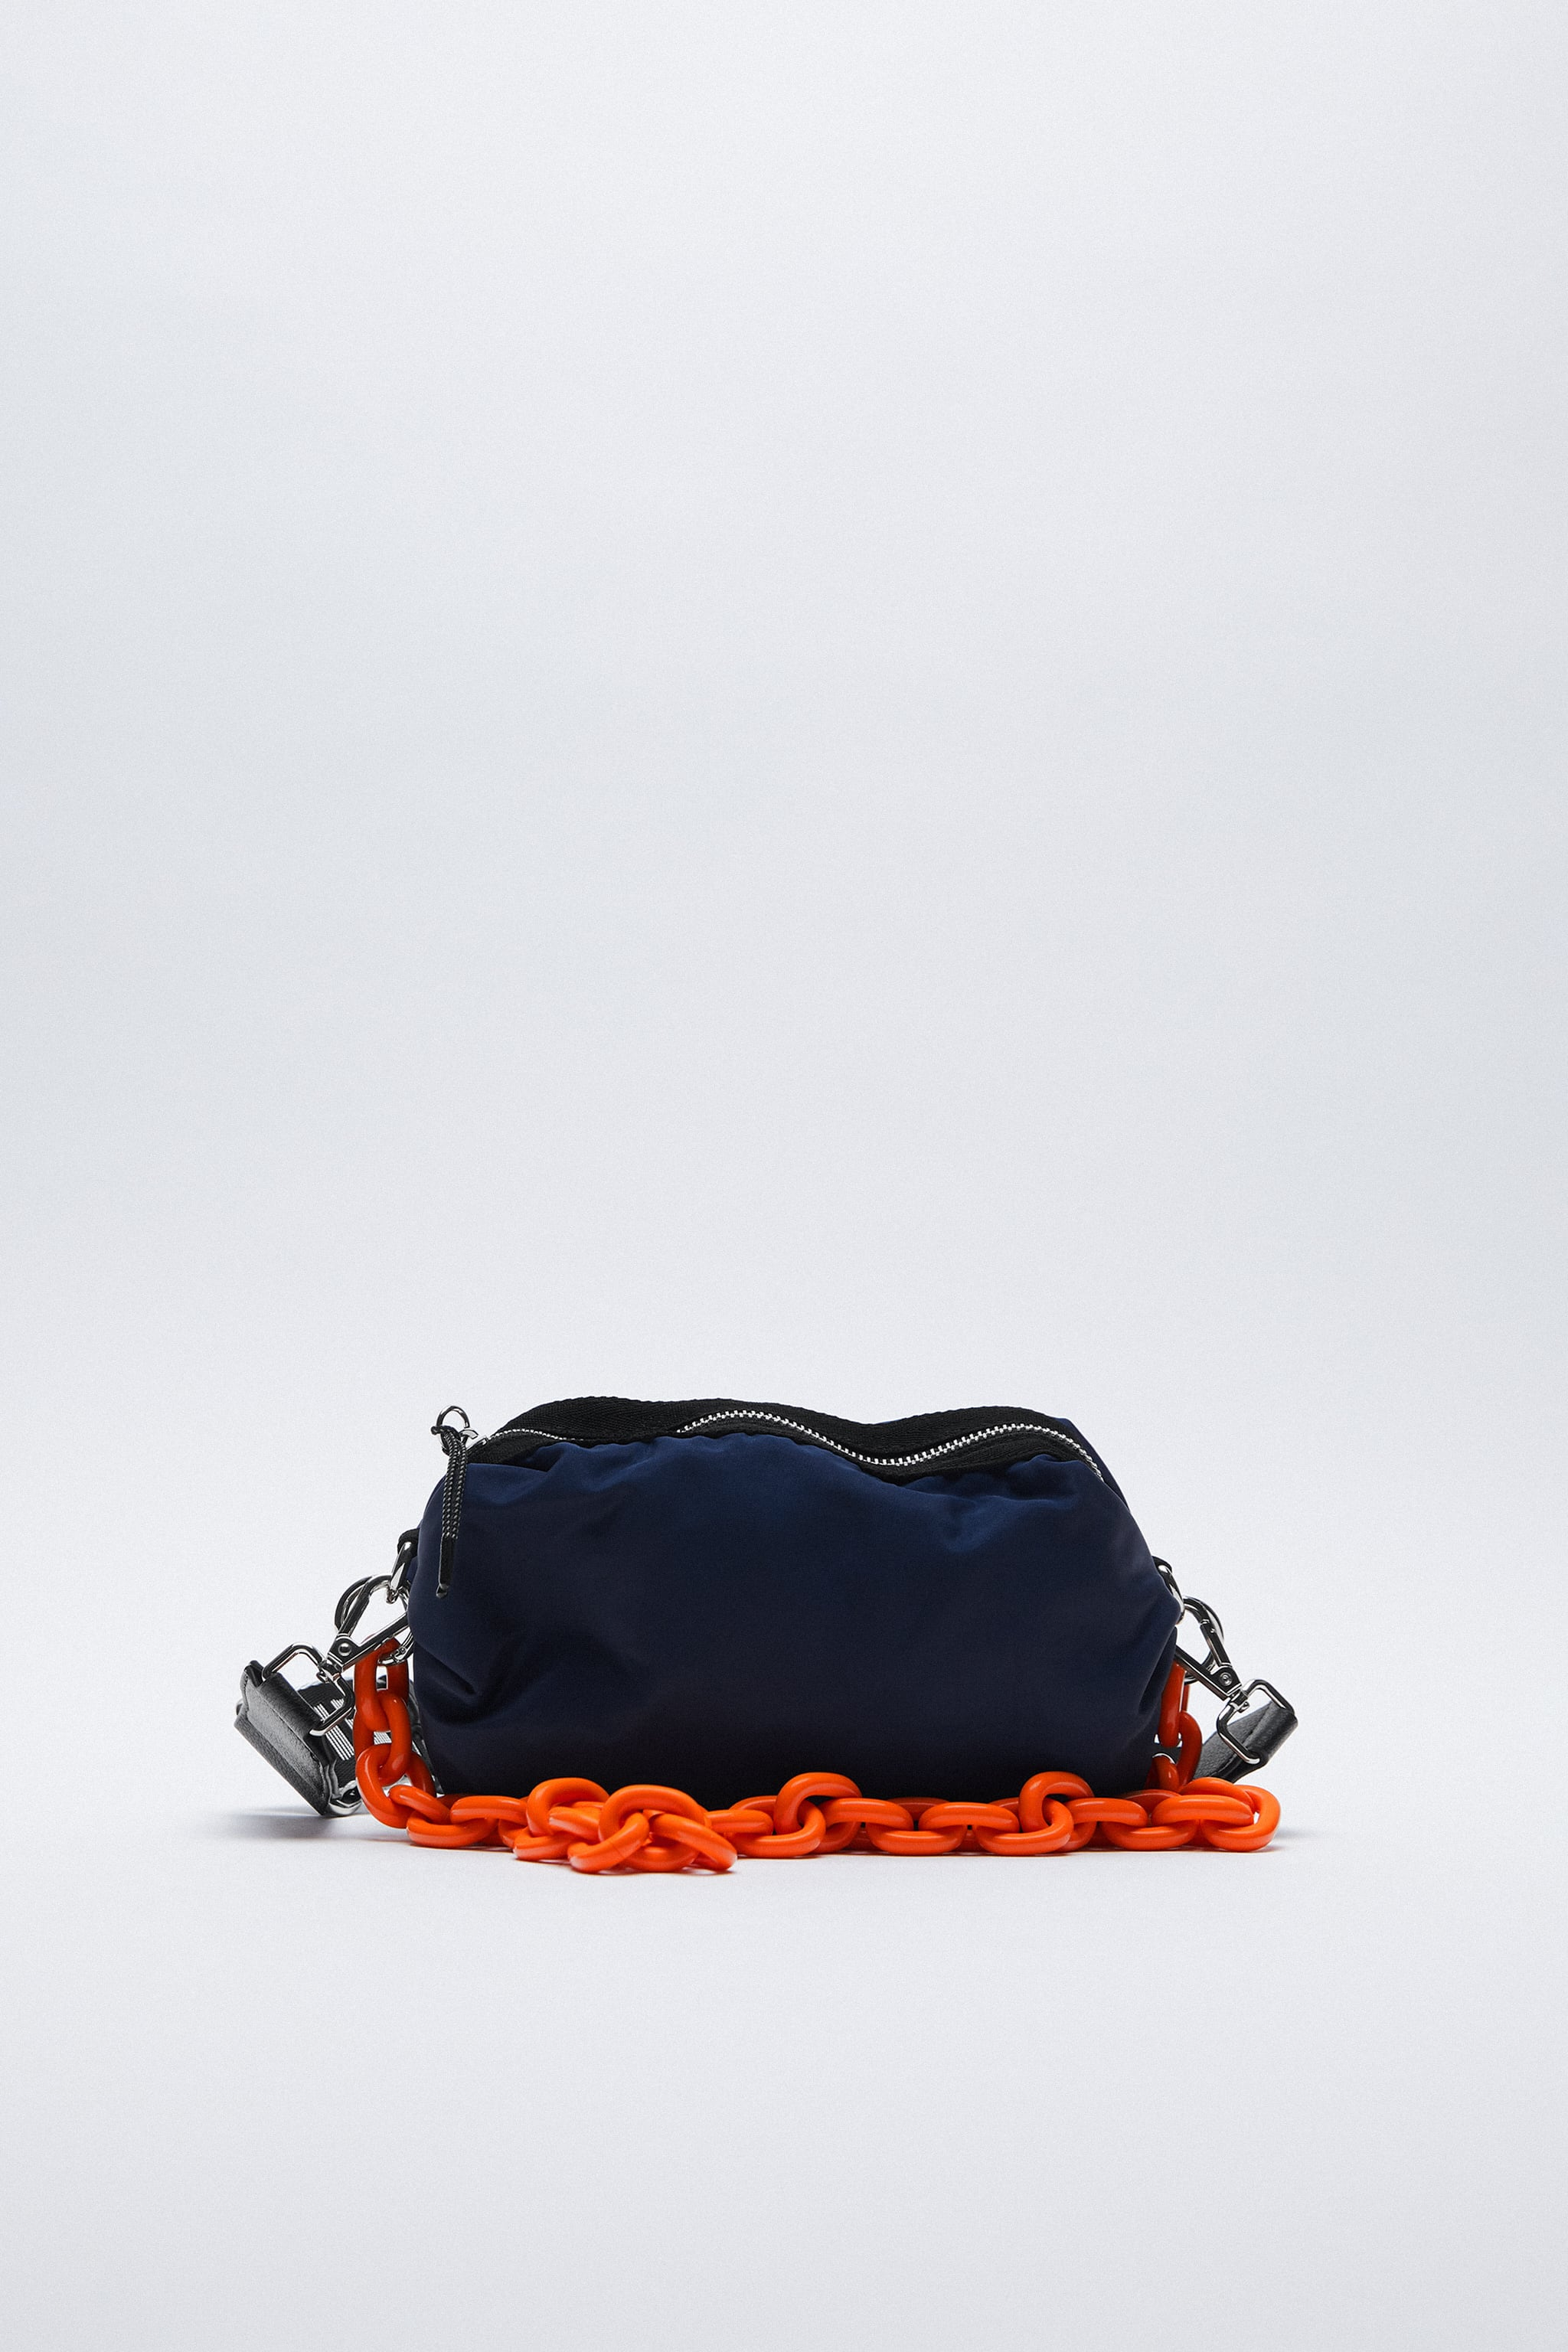 Zara NYLON CROSSBODY BAG WITH CHAIN AND TEXT DETAIL